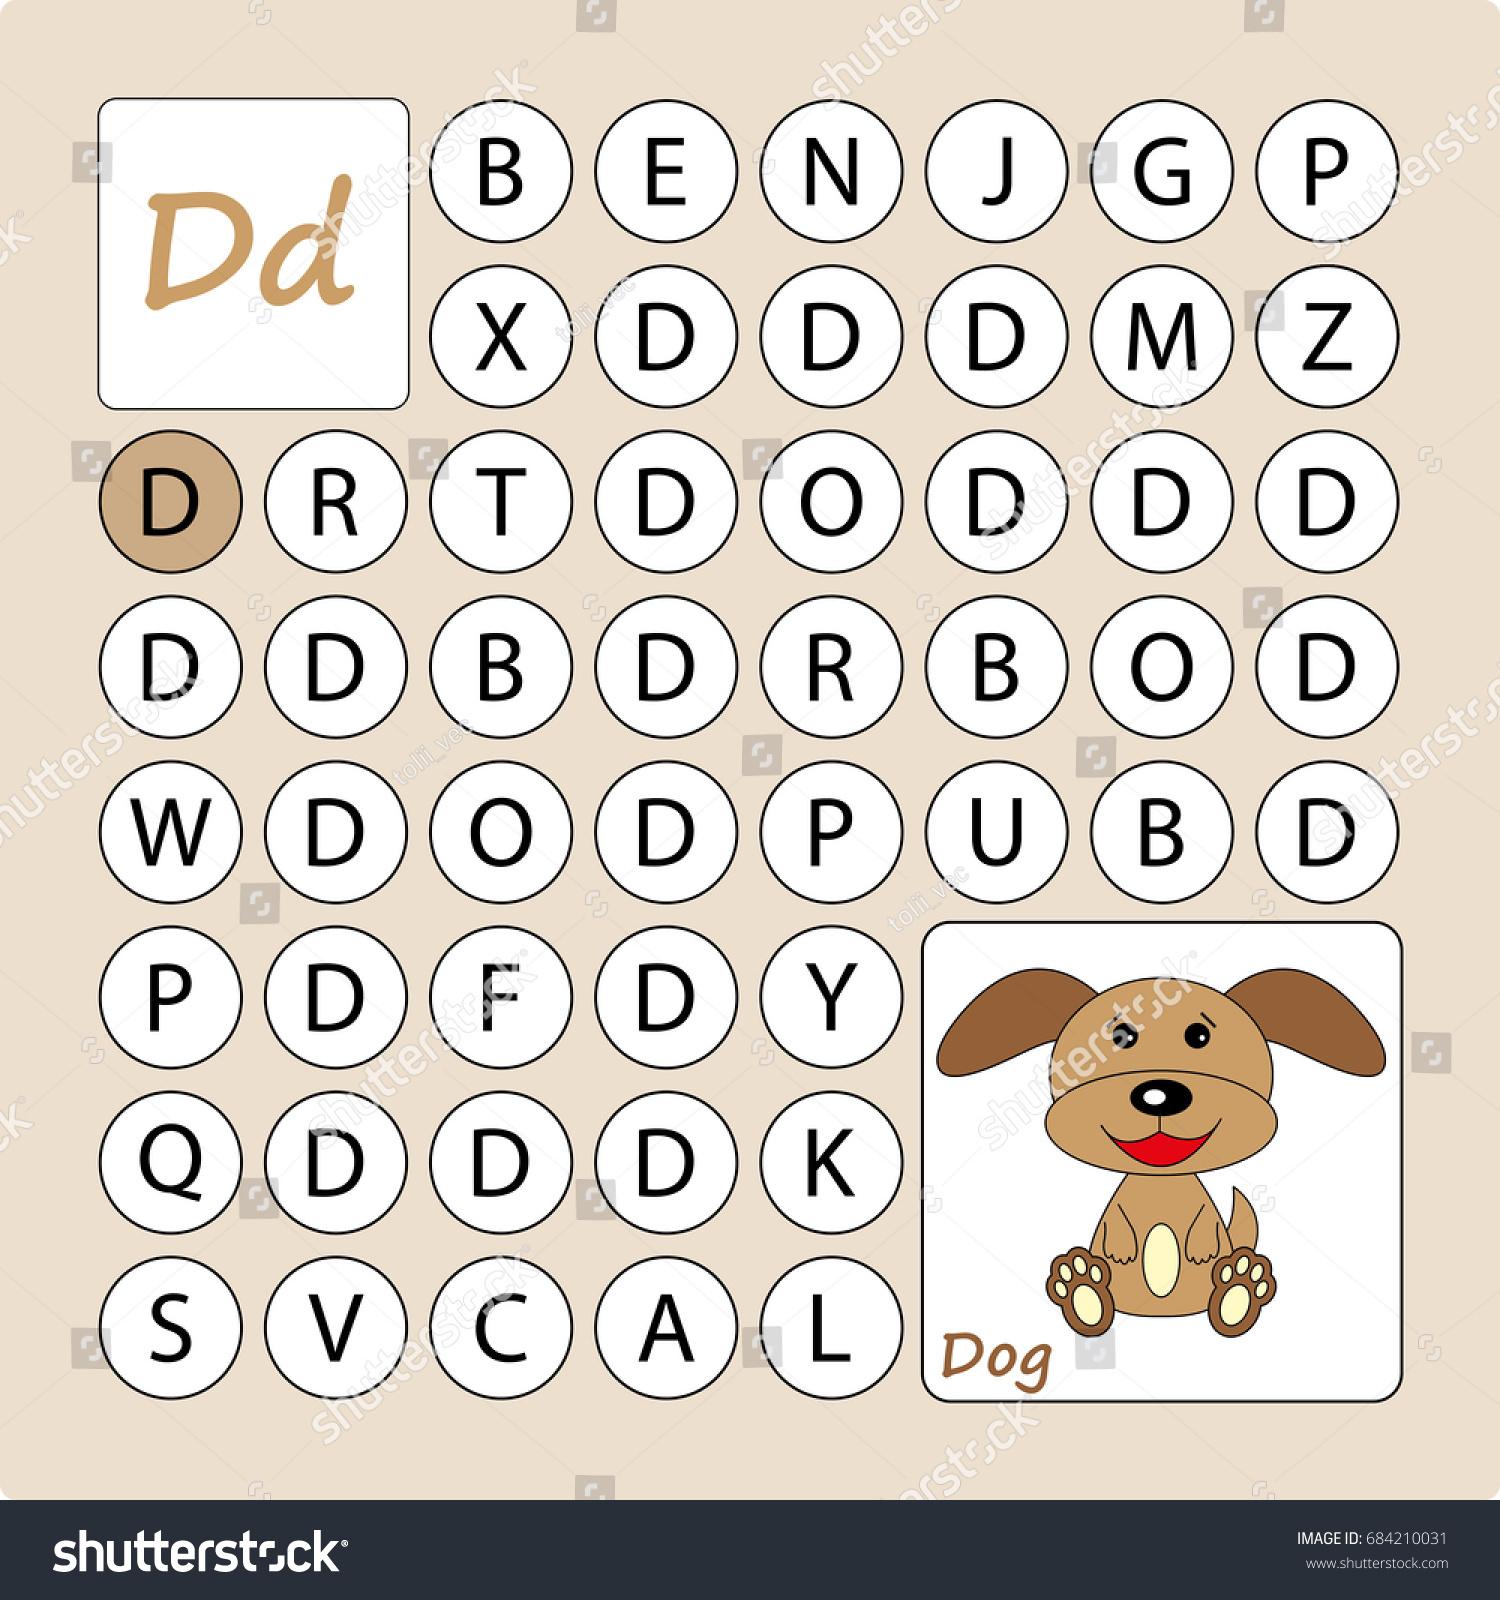 Alphabetical Labyrinth Learning Letter D Task Stock Vector